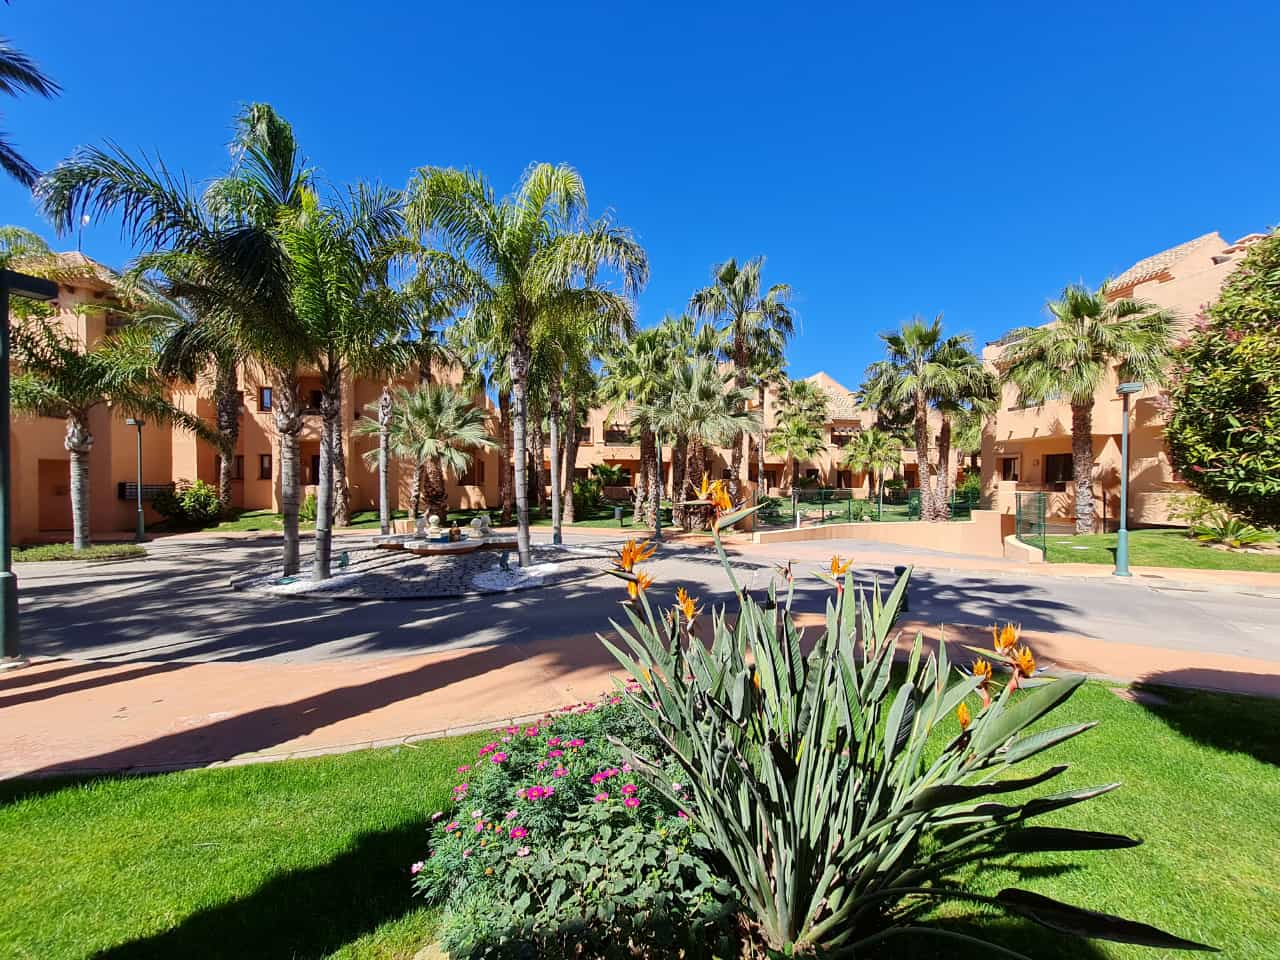 Residential Nueva Ribera Beach Club Apartments – 1 minute walk from the beach – Los Alcazares